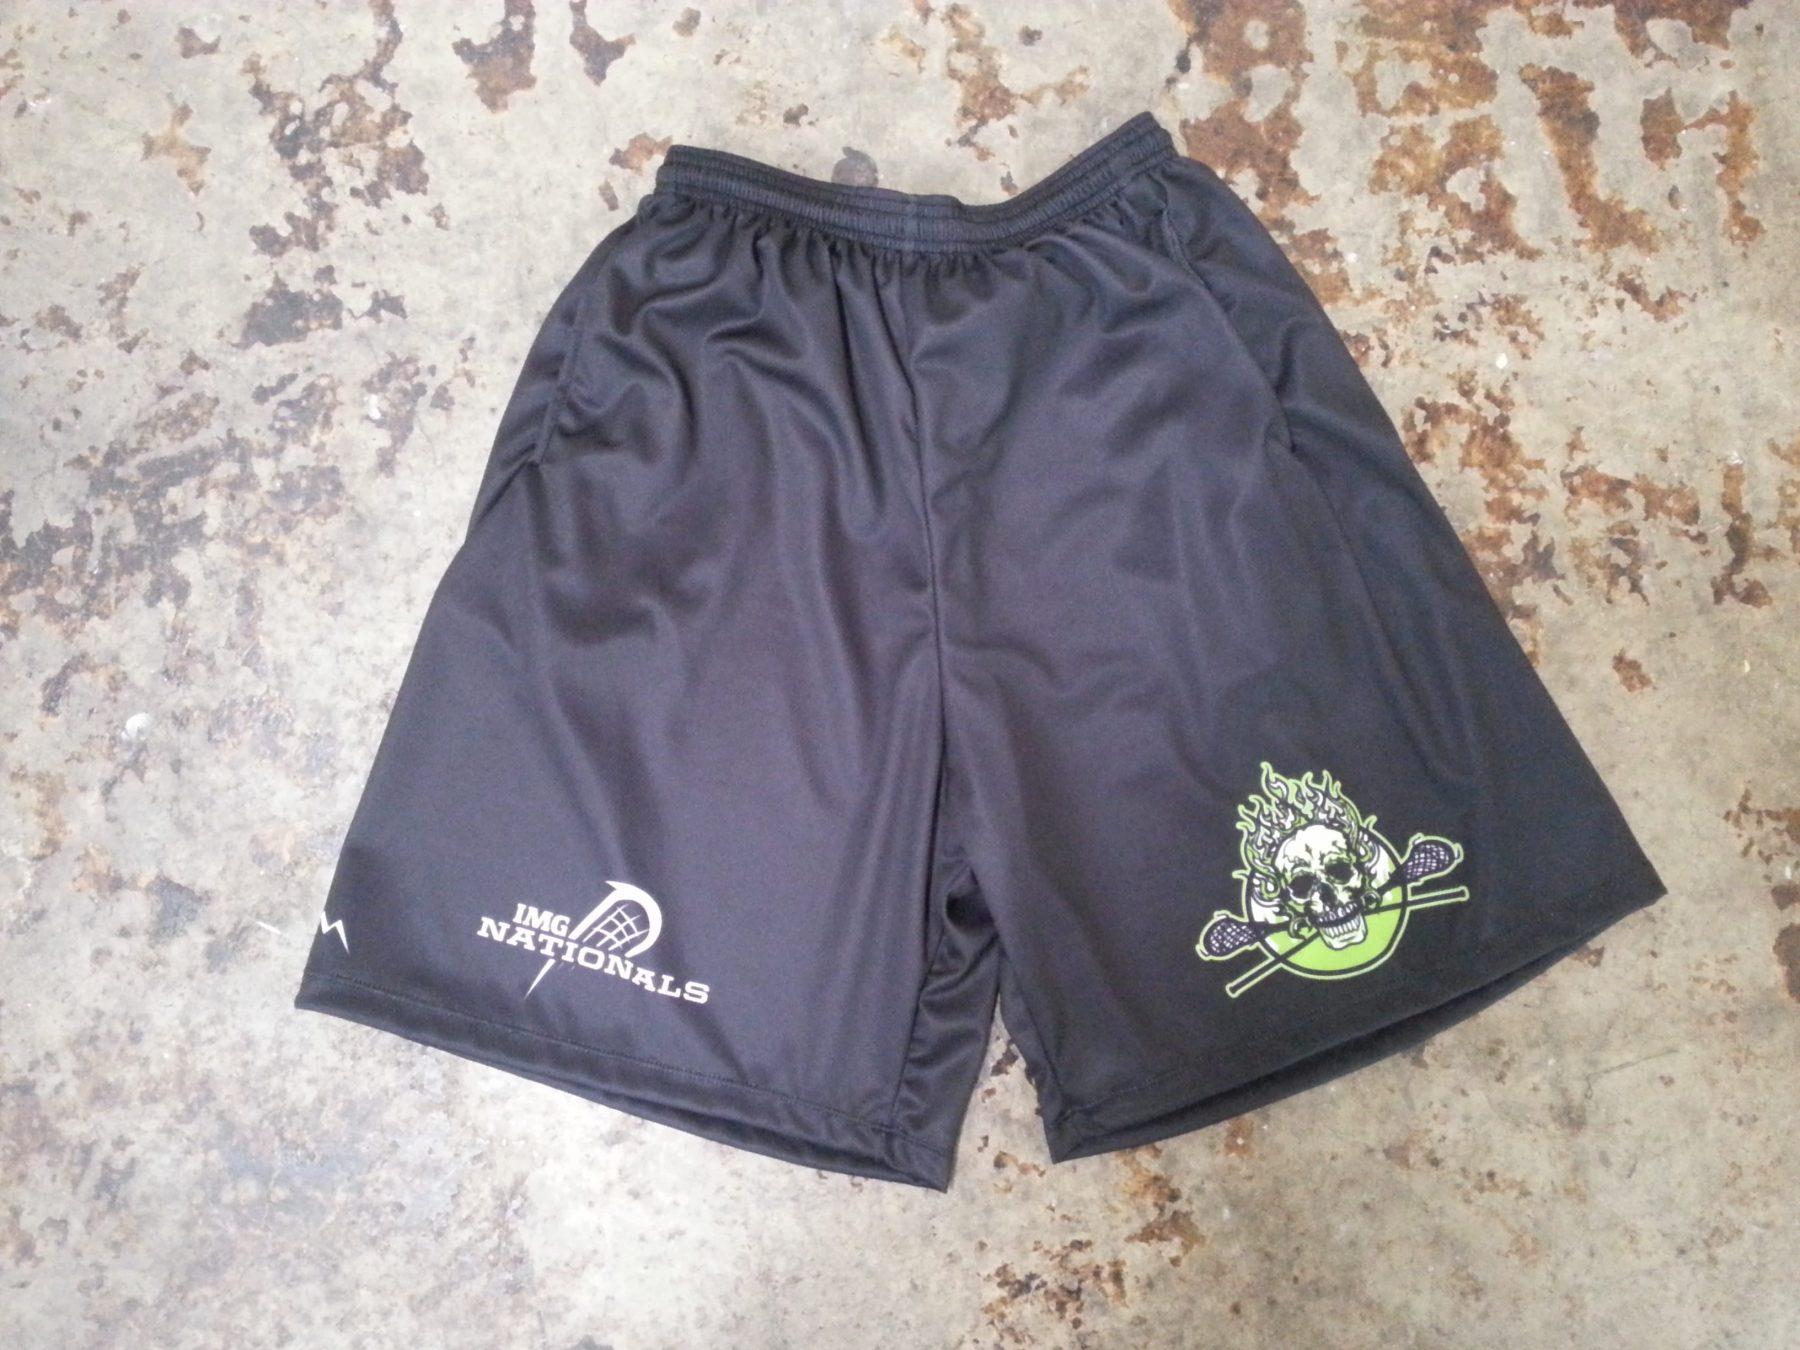 customized lacrosse shorts in georgia